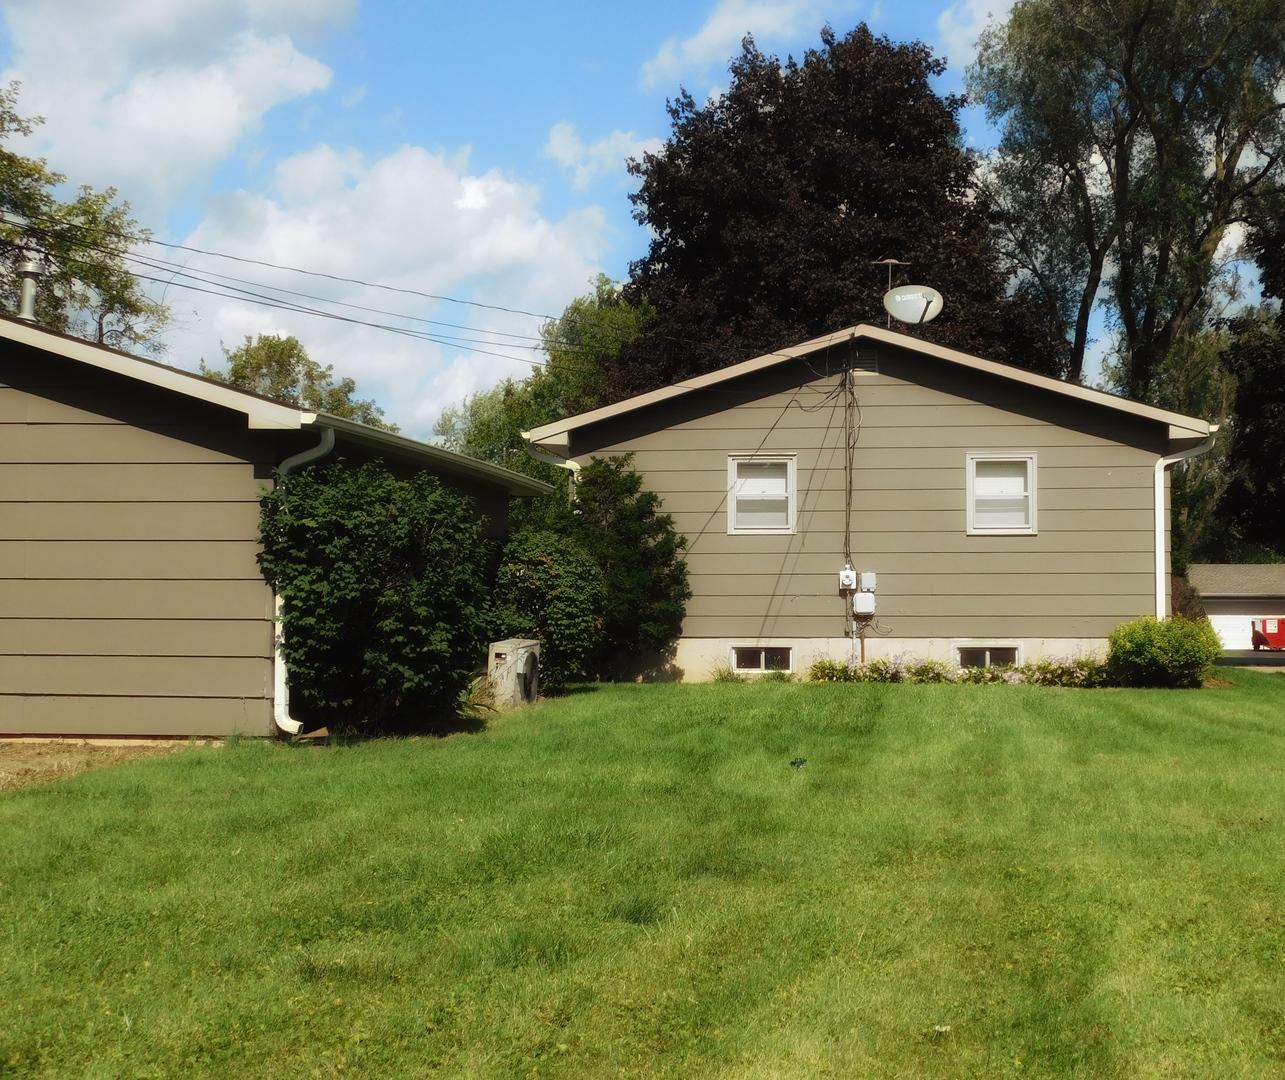 18119 West Big Oaks, Grayslake, Illinois, 60030